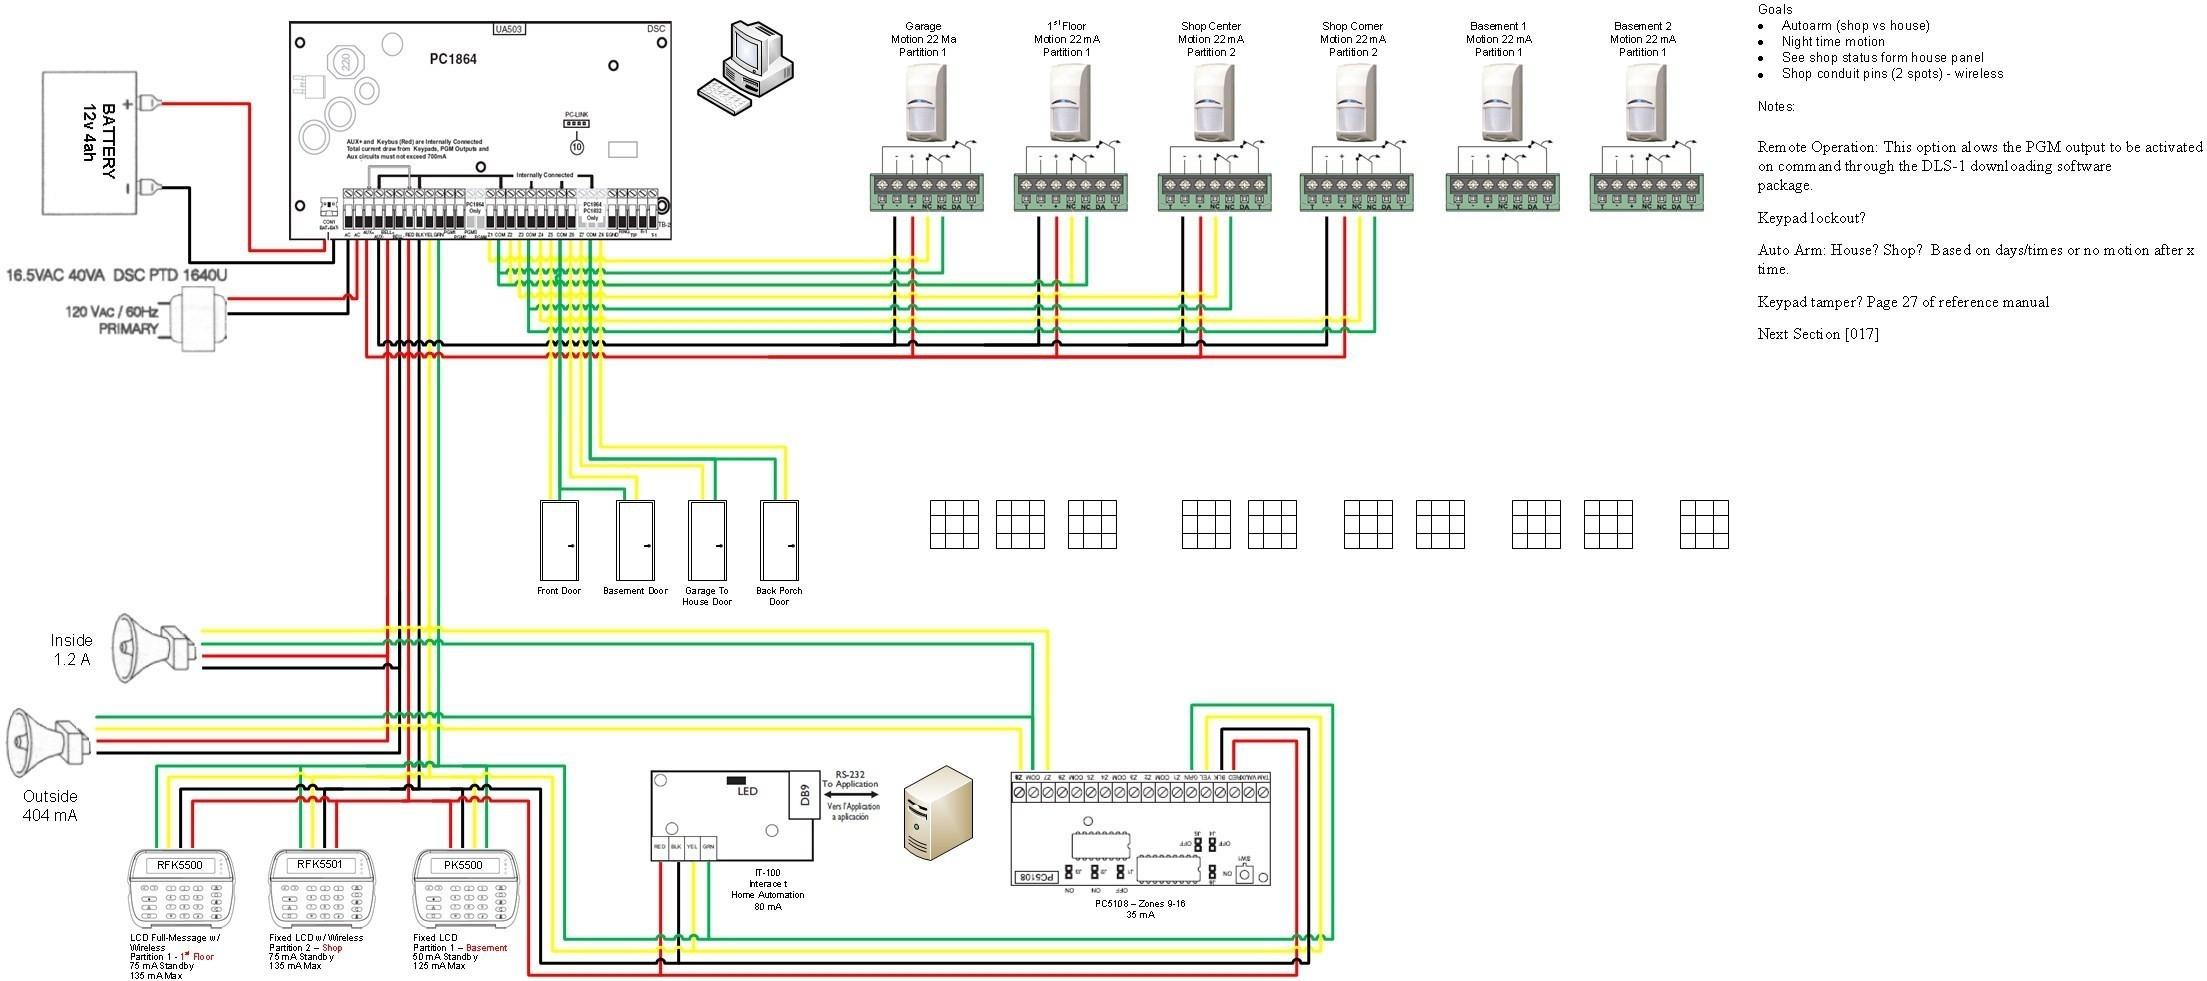 Carvox Alarm Wiring Diagram | Free Wiring Diagram on